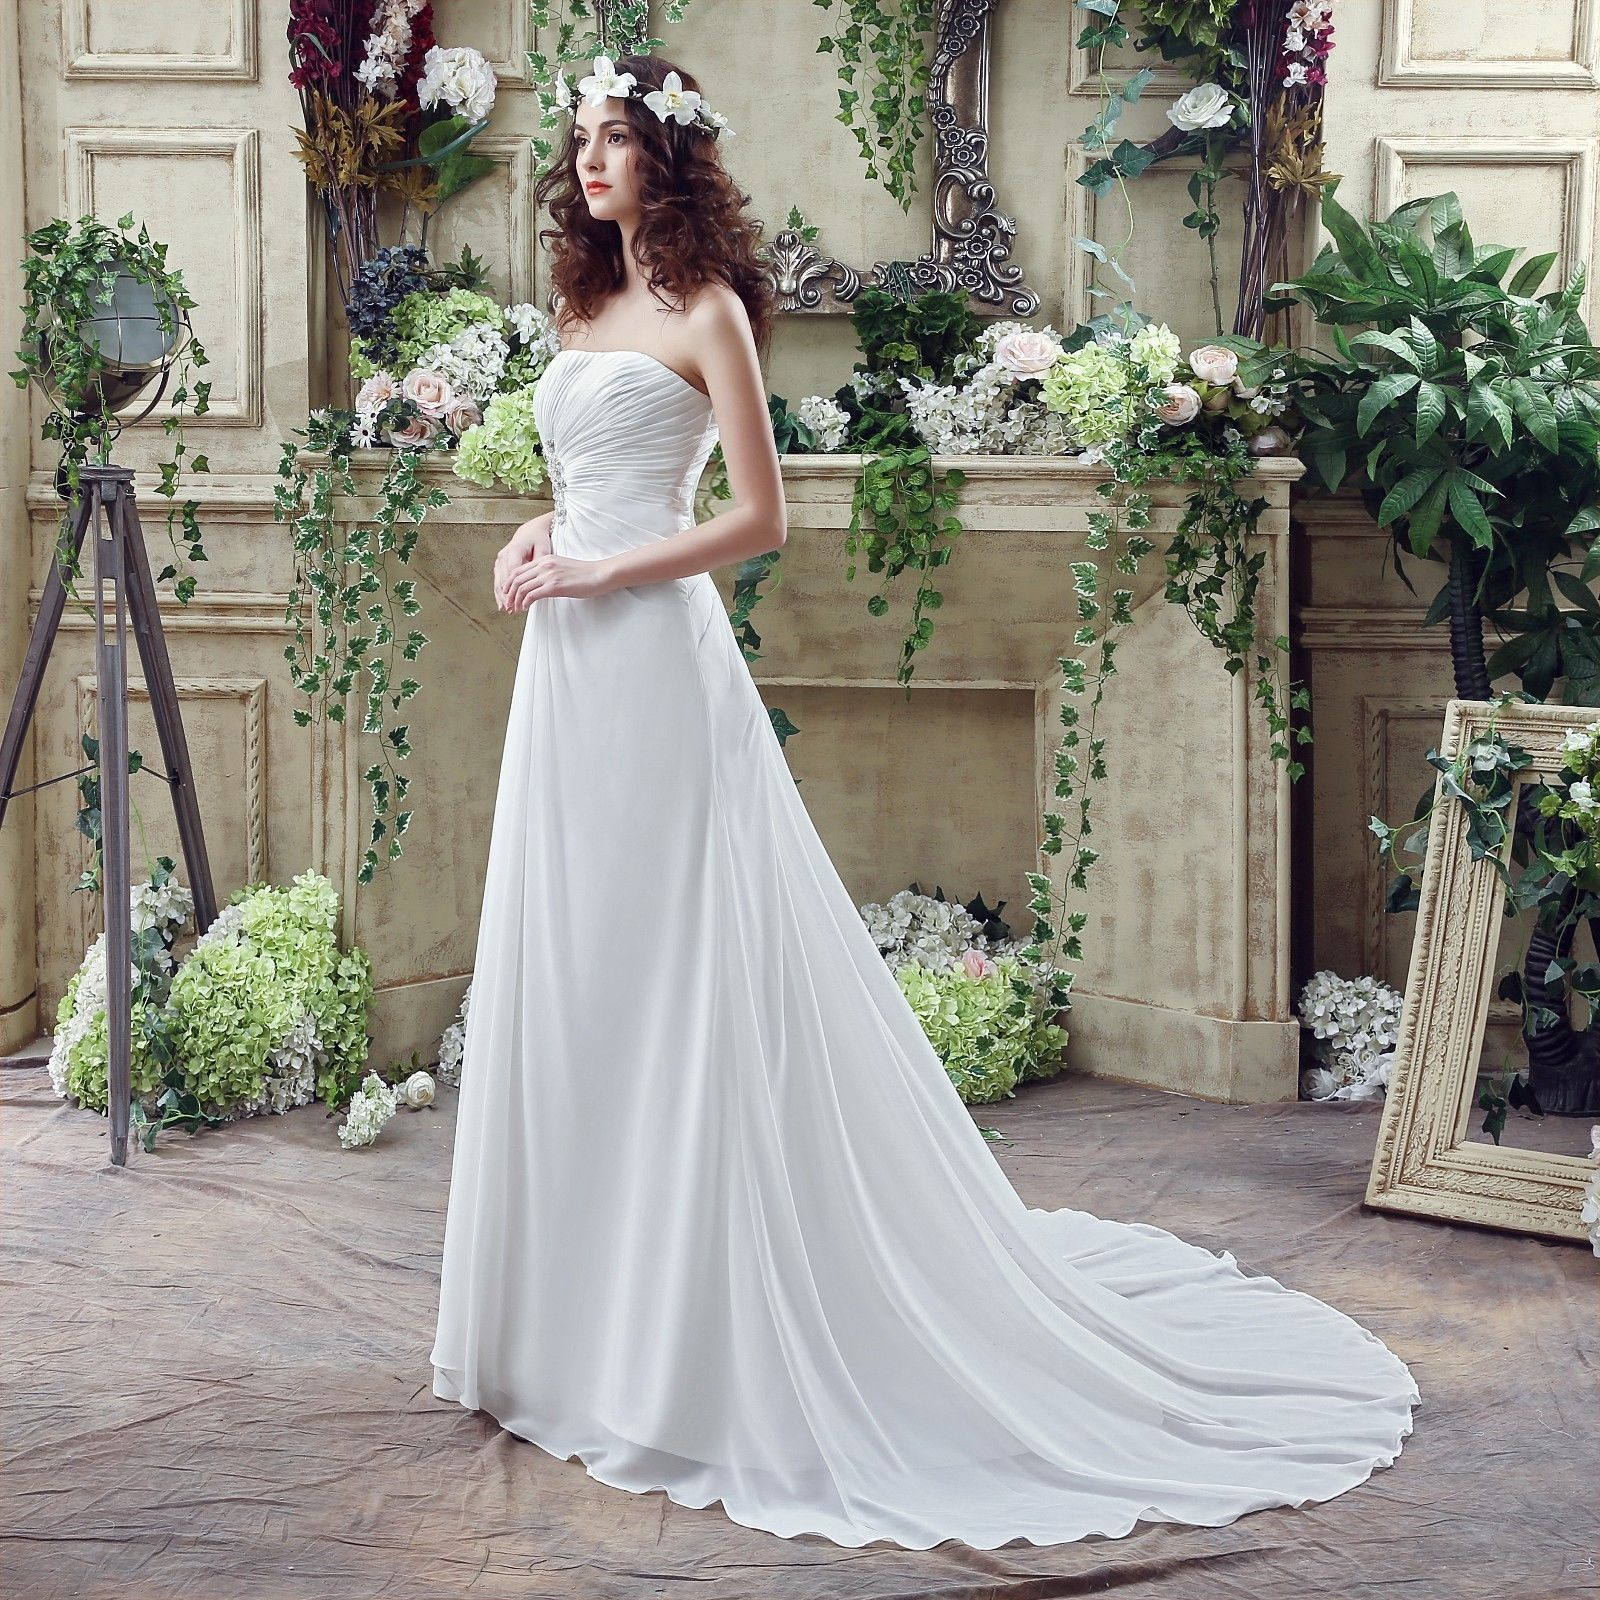 Beach wedding party dresses  In Stock WhiteIvory Chiffon Beach Wedding Dress Gowns Us Size